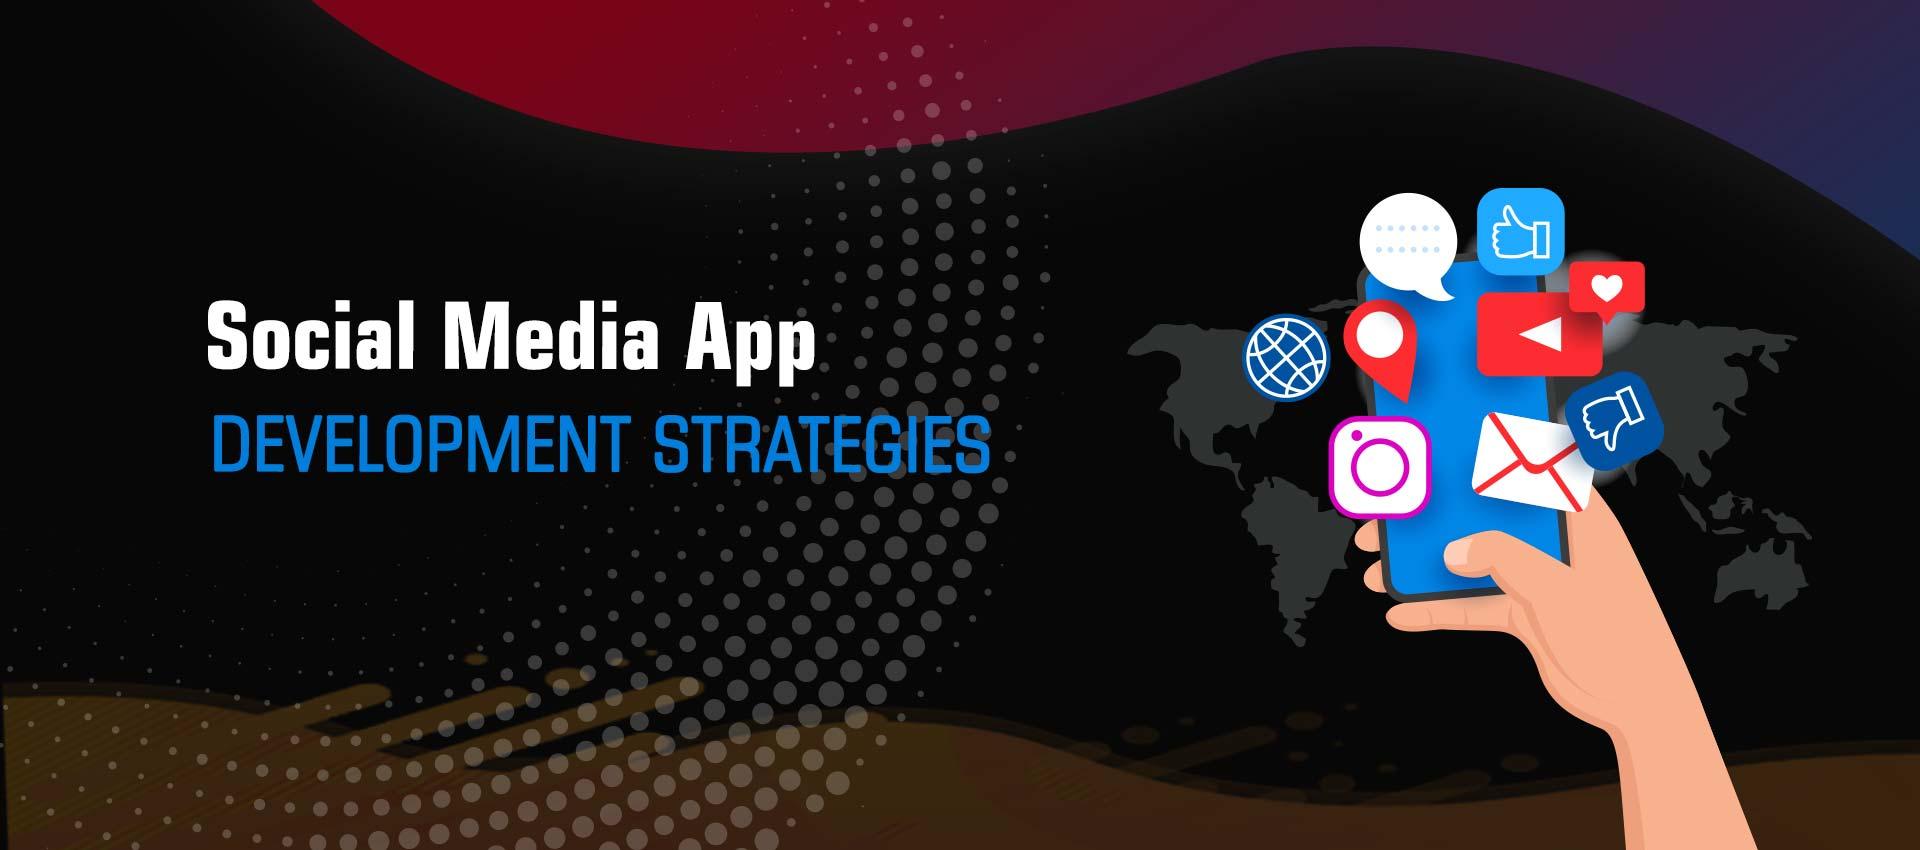 Top 5 Social Media App Development Strategies 2020 - Mobiweb